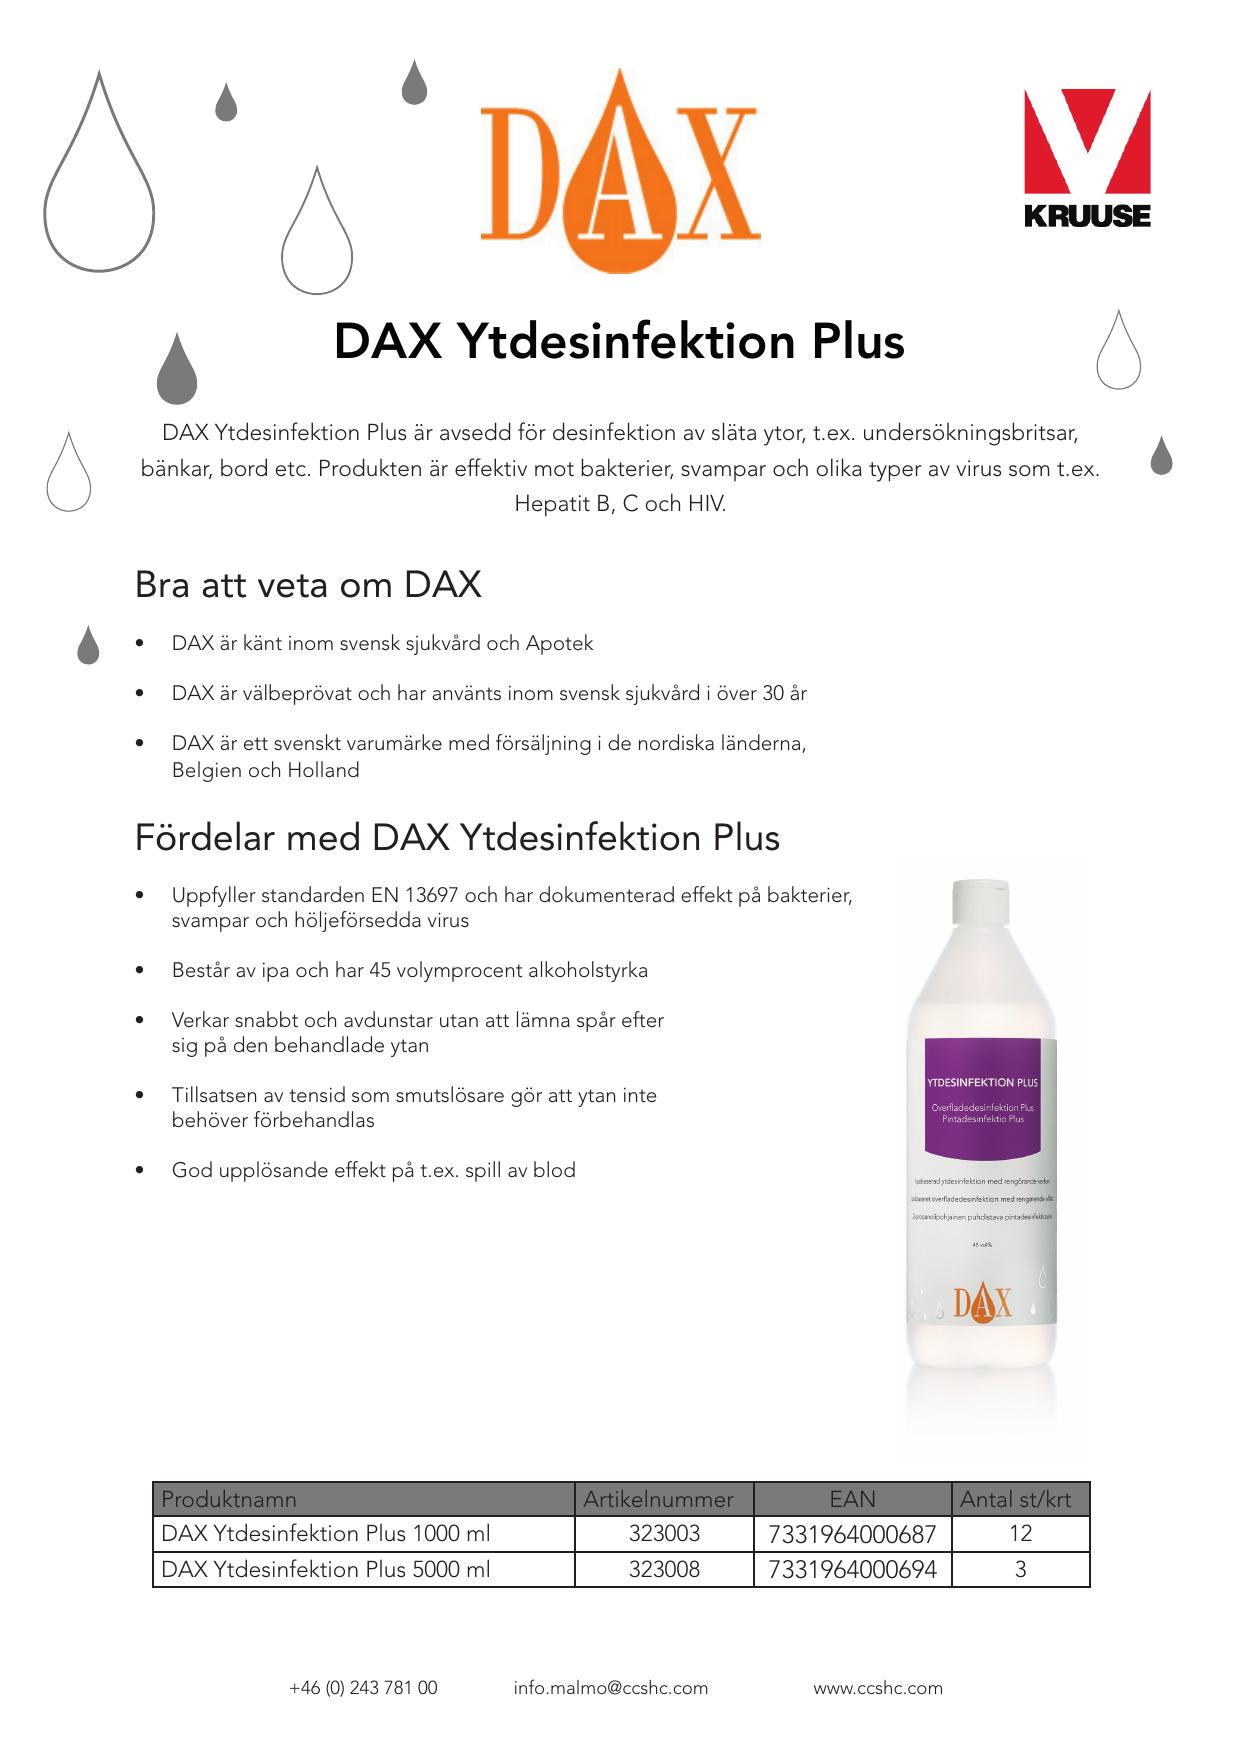 dax ytdesinfektion plus